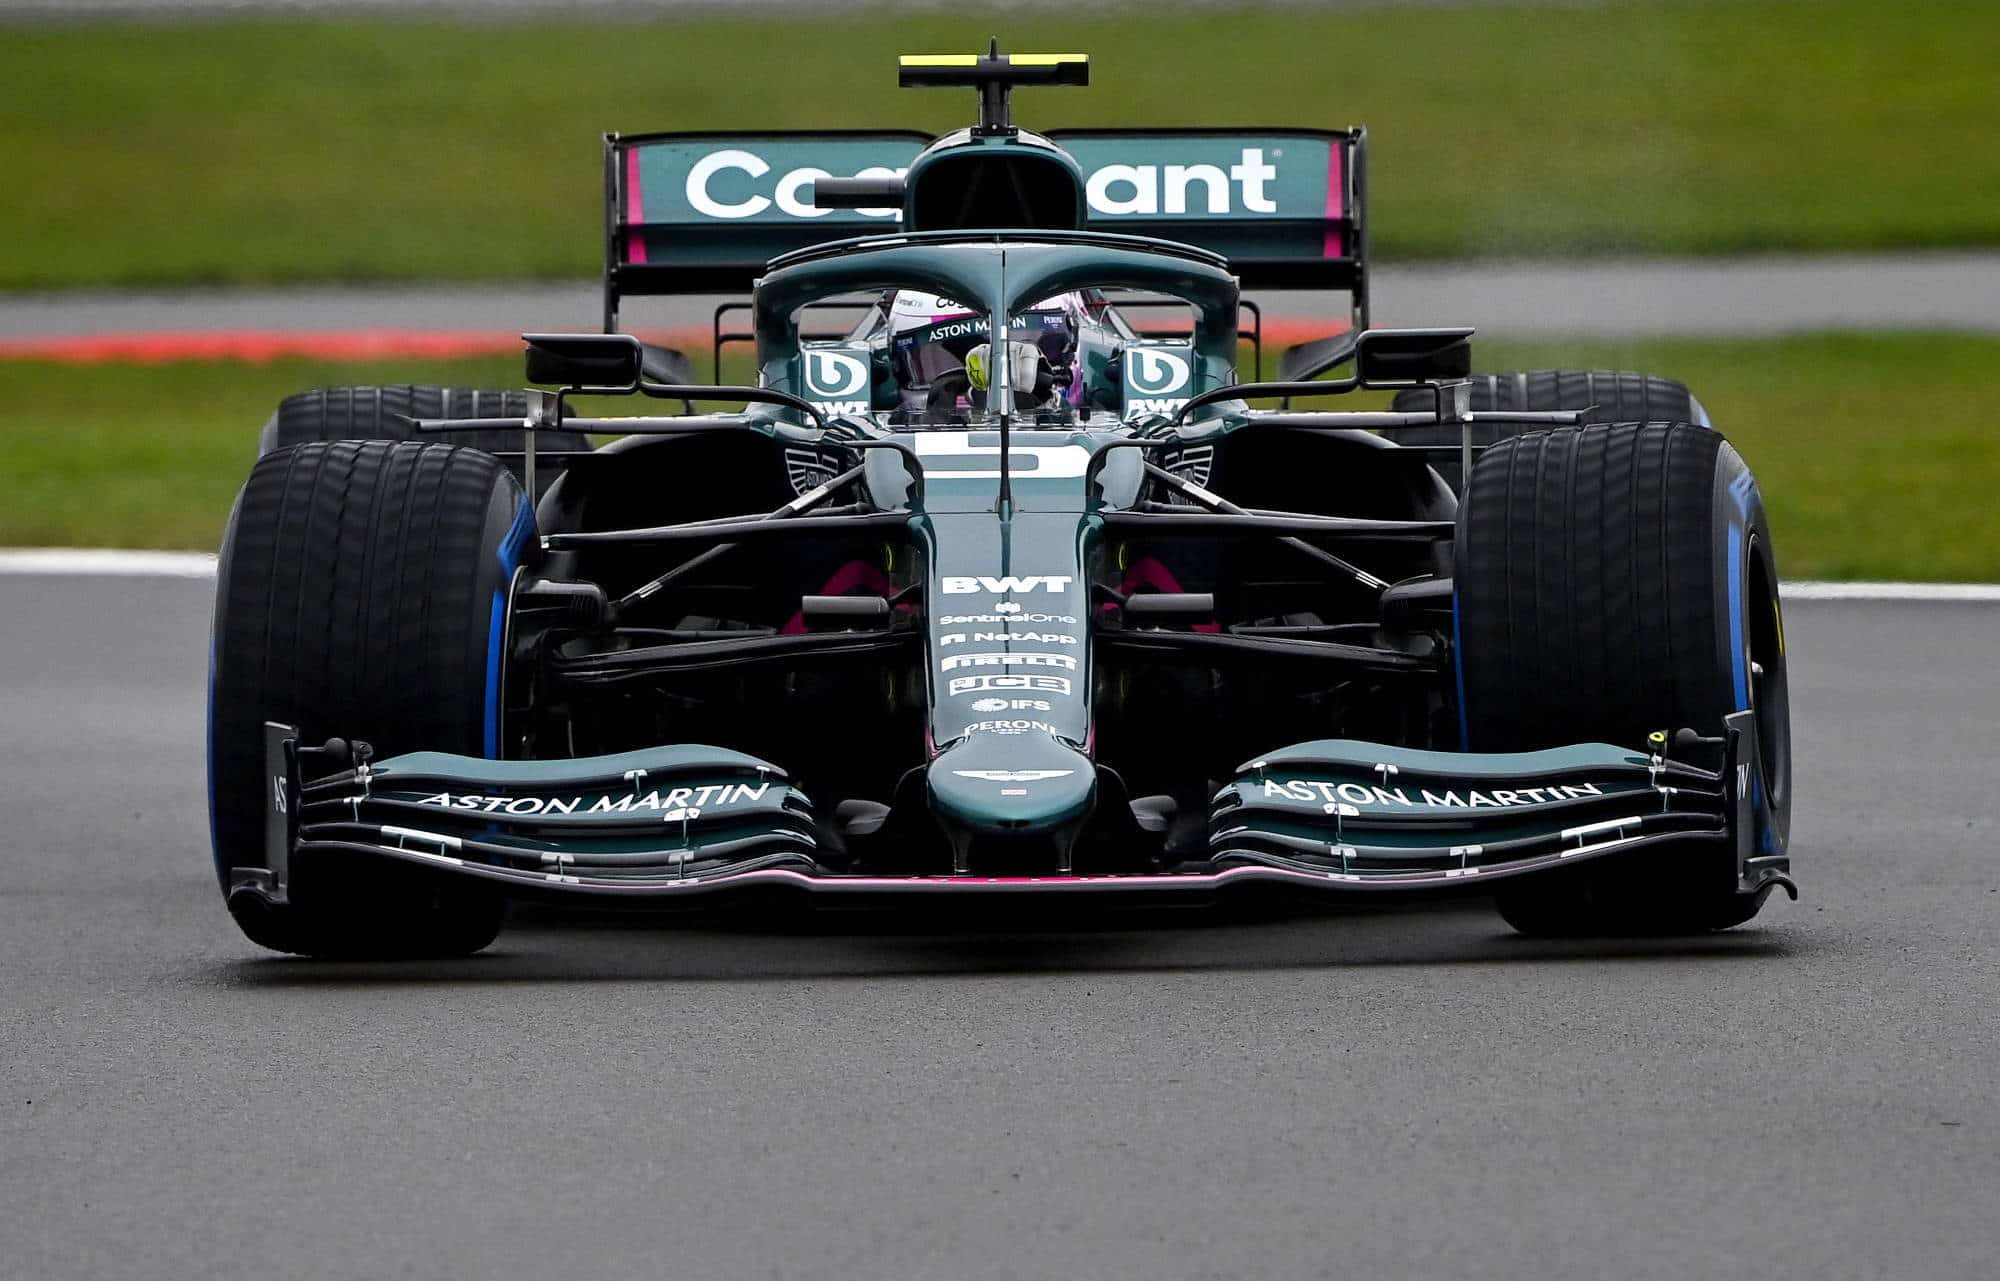 2021 Sebastian Vettel Aston Martin Cognizant F1 Team new 2021 F1 car AMR21 shakedown Silverstone March 4 2021 Photo Aston Martin